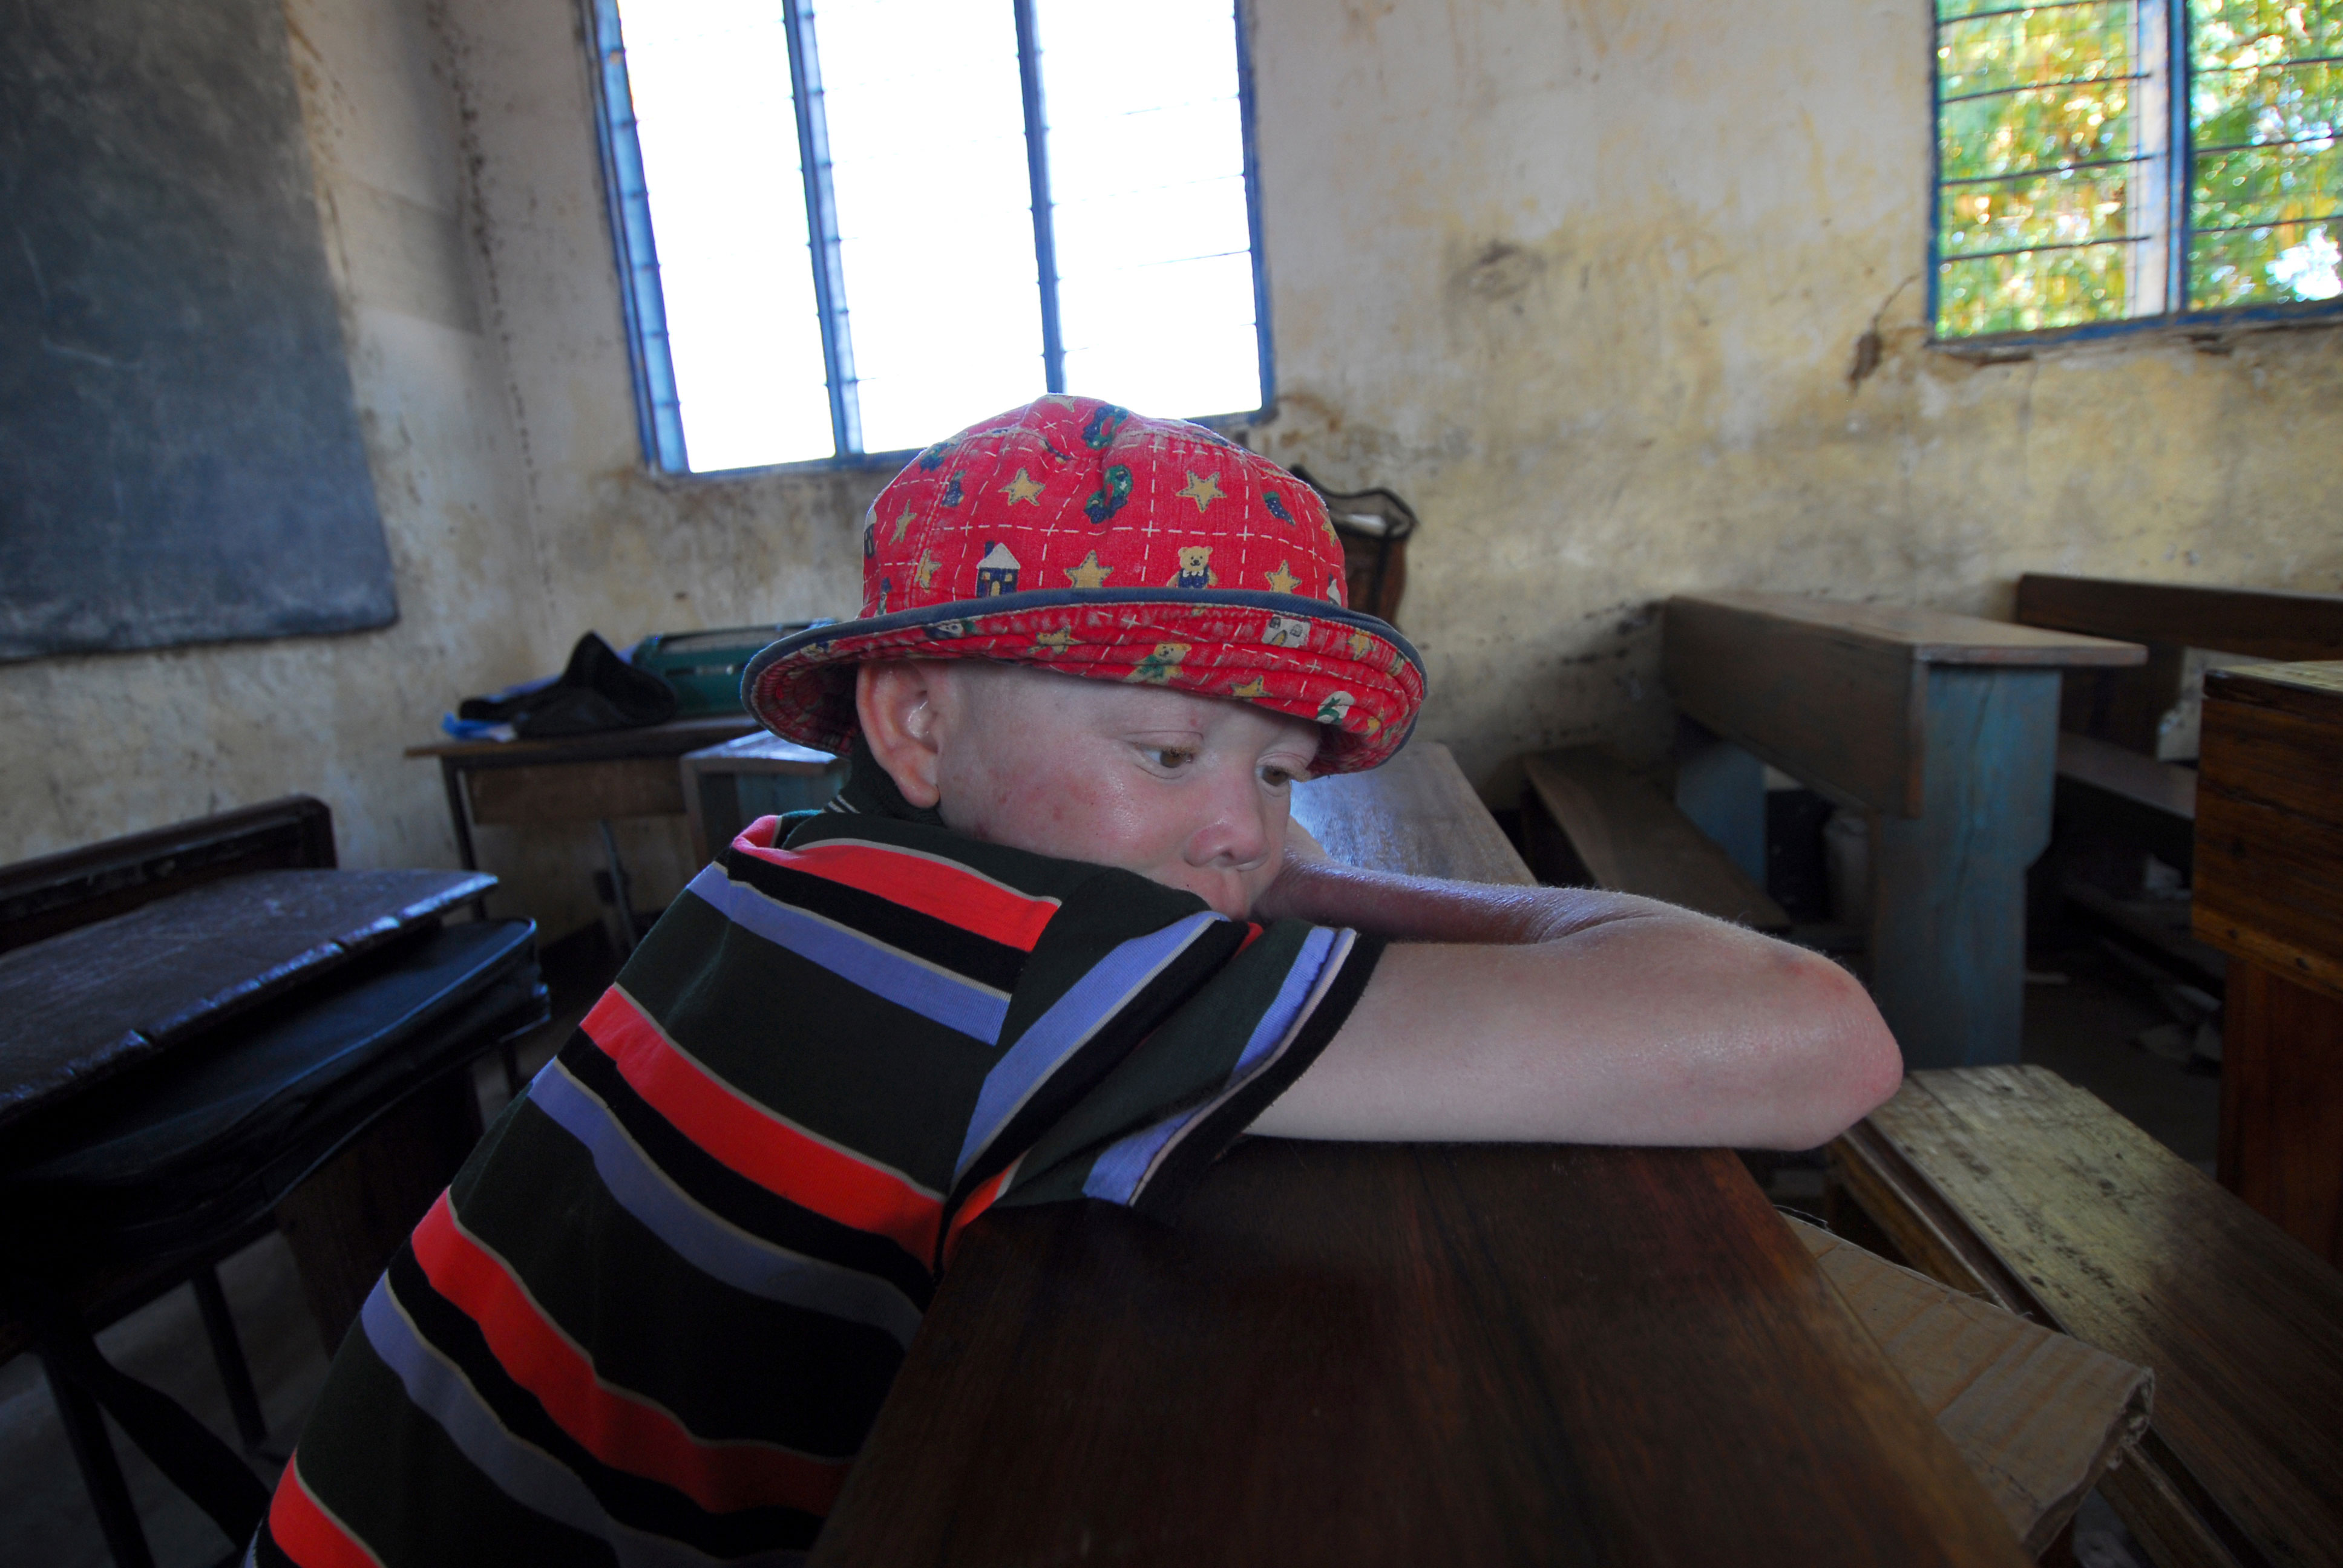 albino-rescue_Humanity-Healing_bigstock-african-albino-153771111